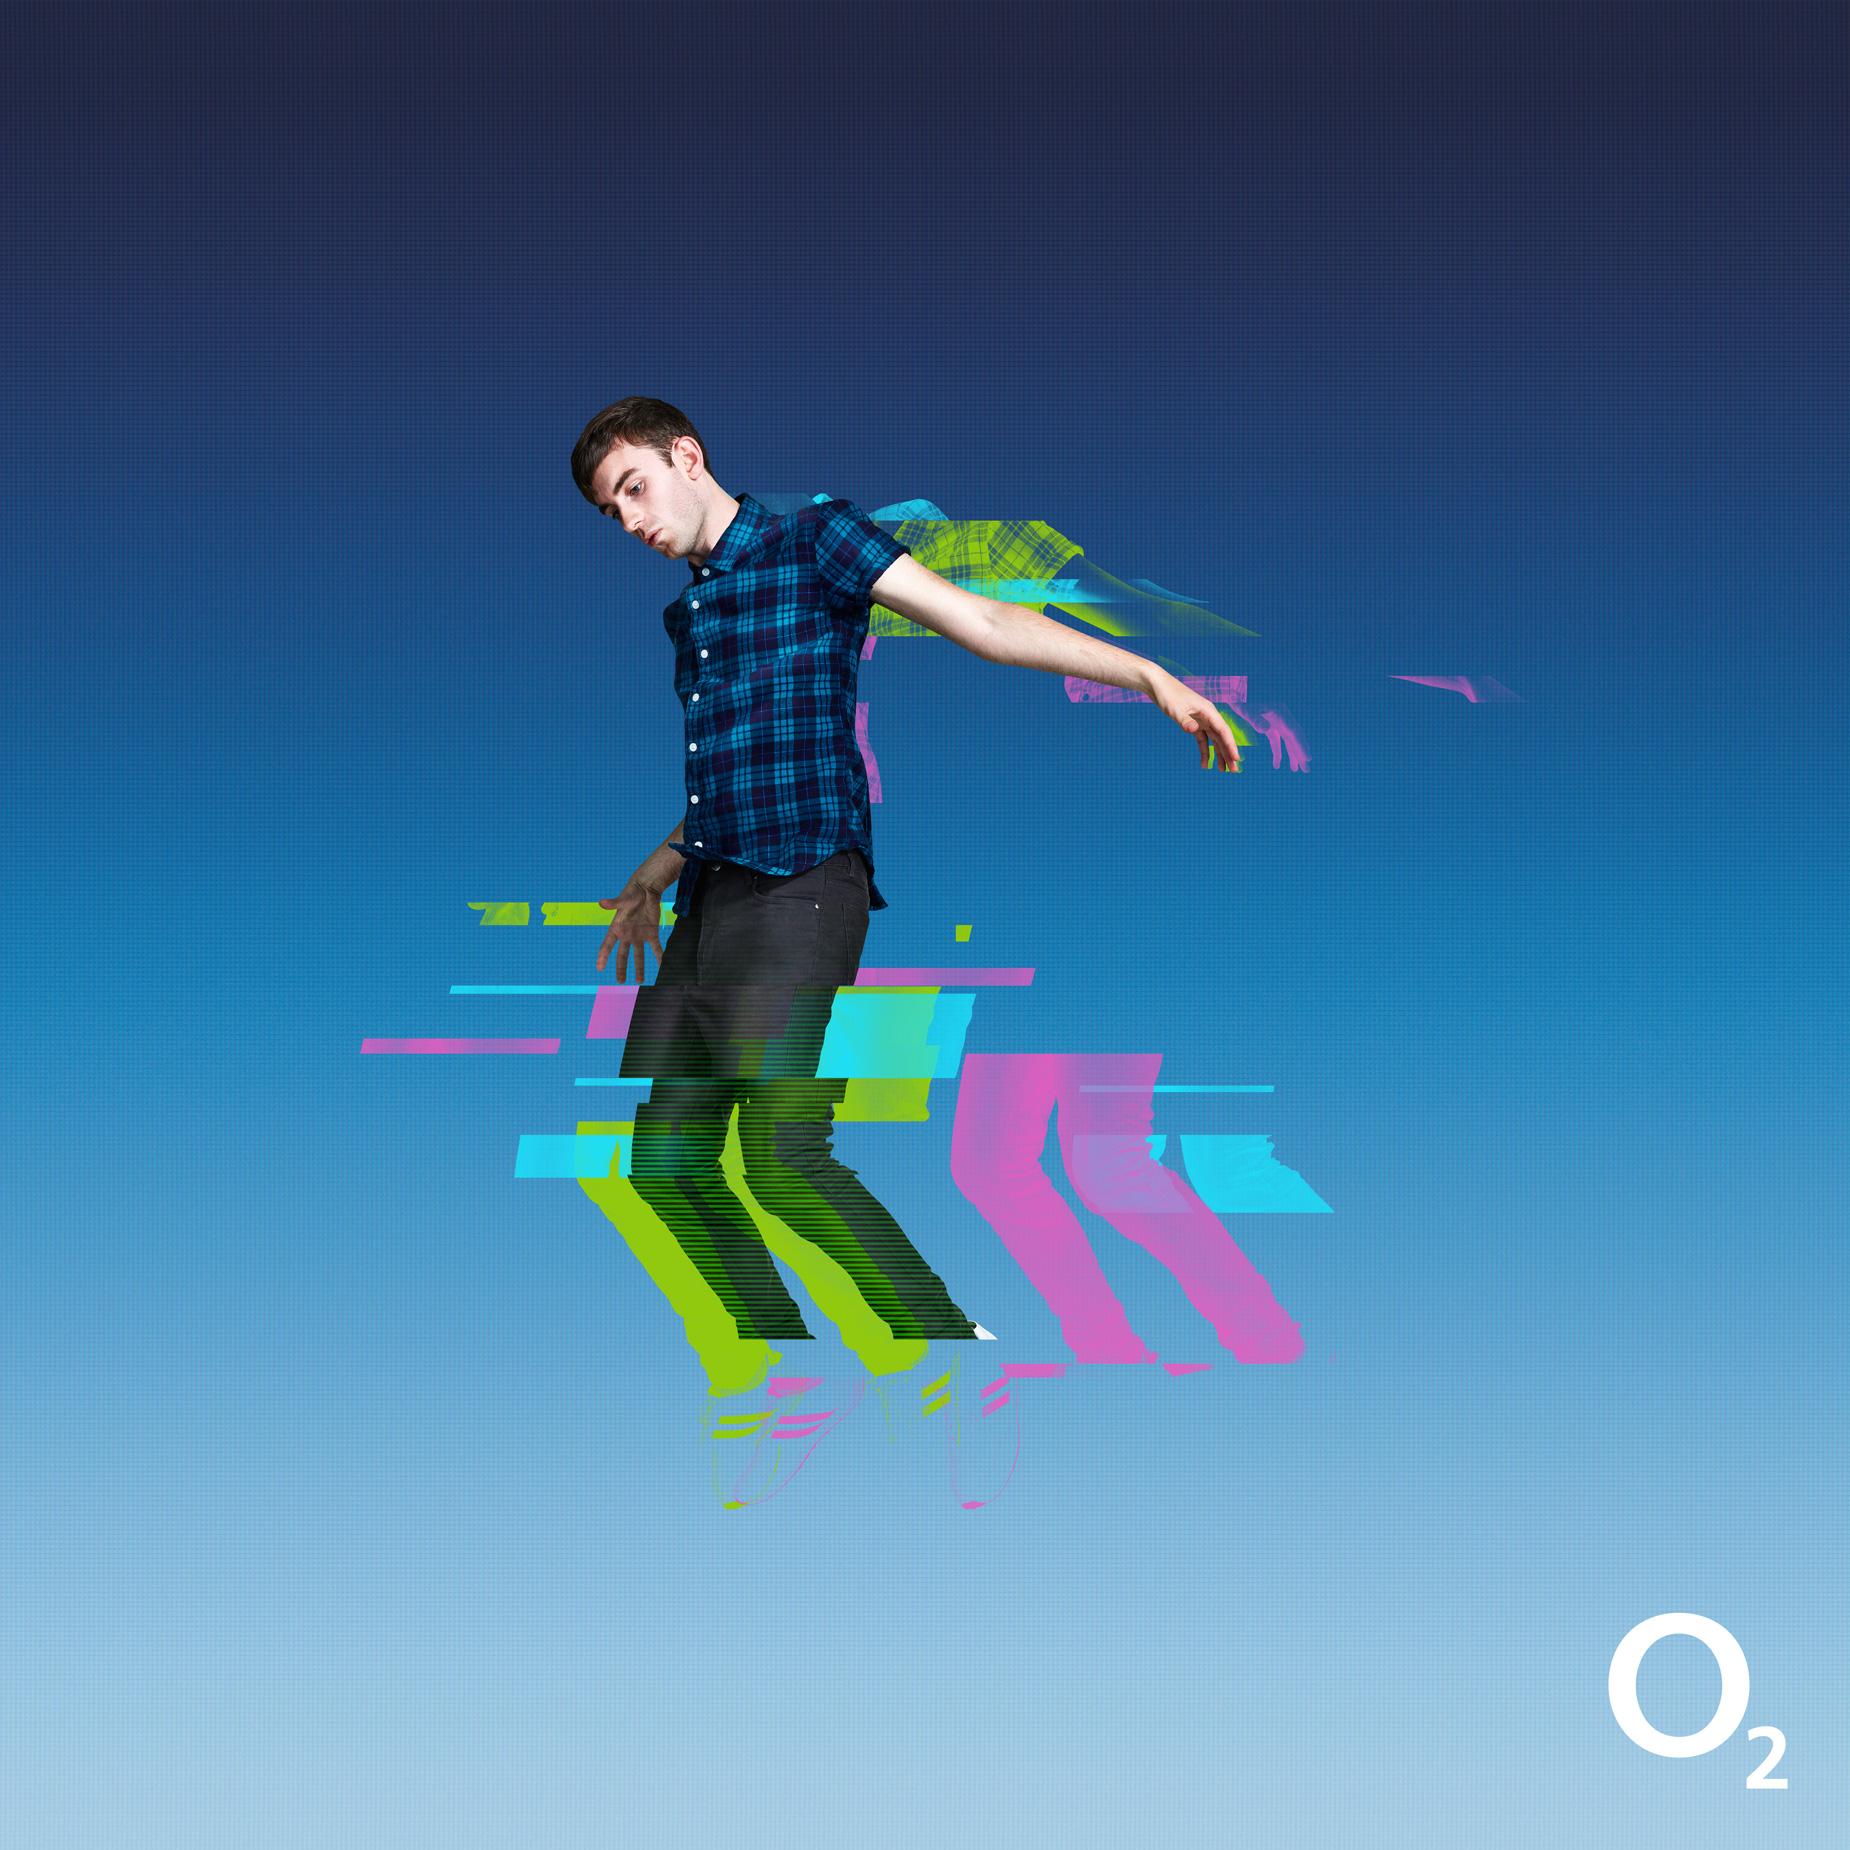 O2-Go-Think-Big-Corry-Raymond-2-Small-RGB